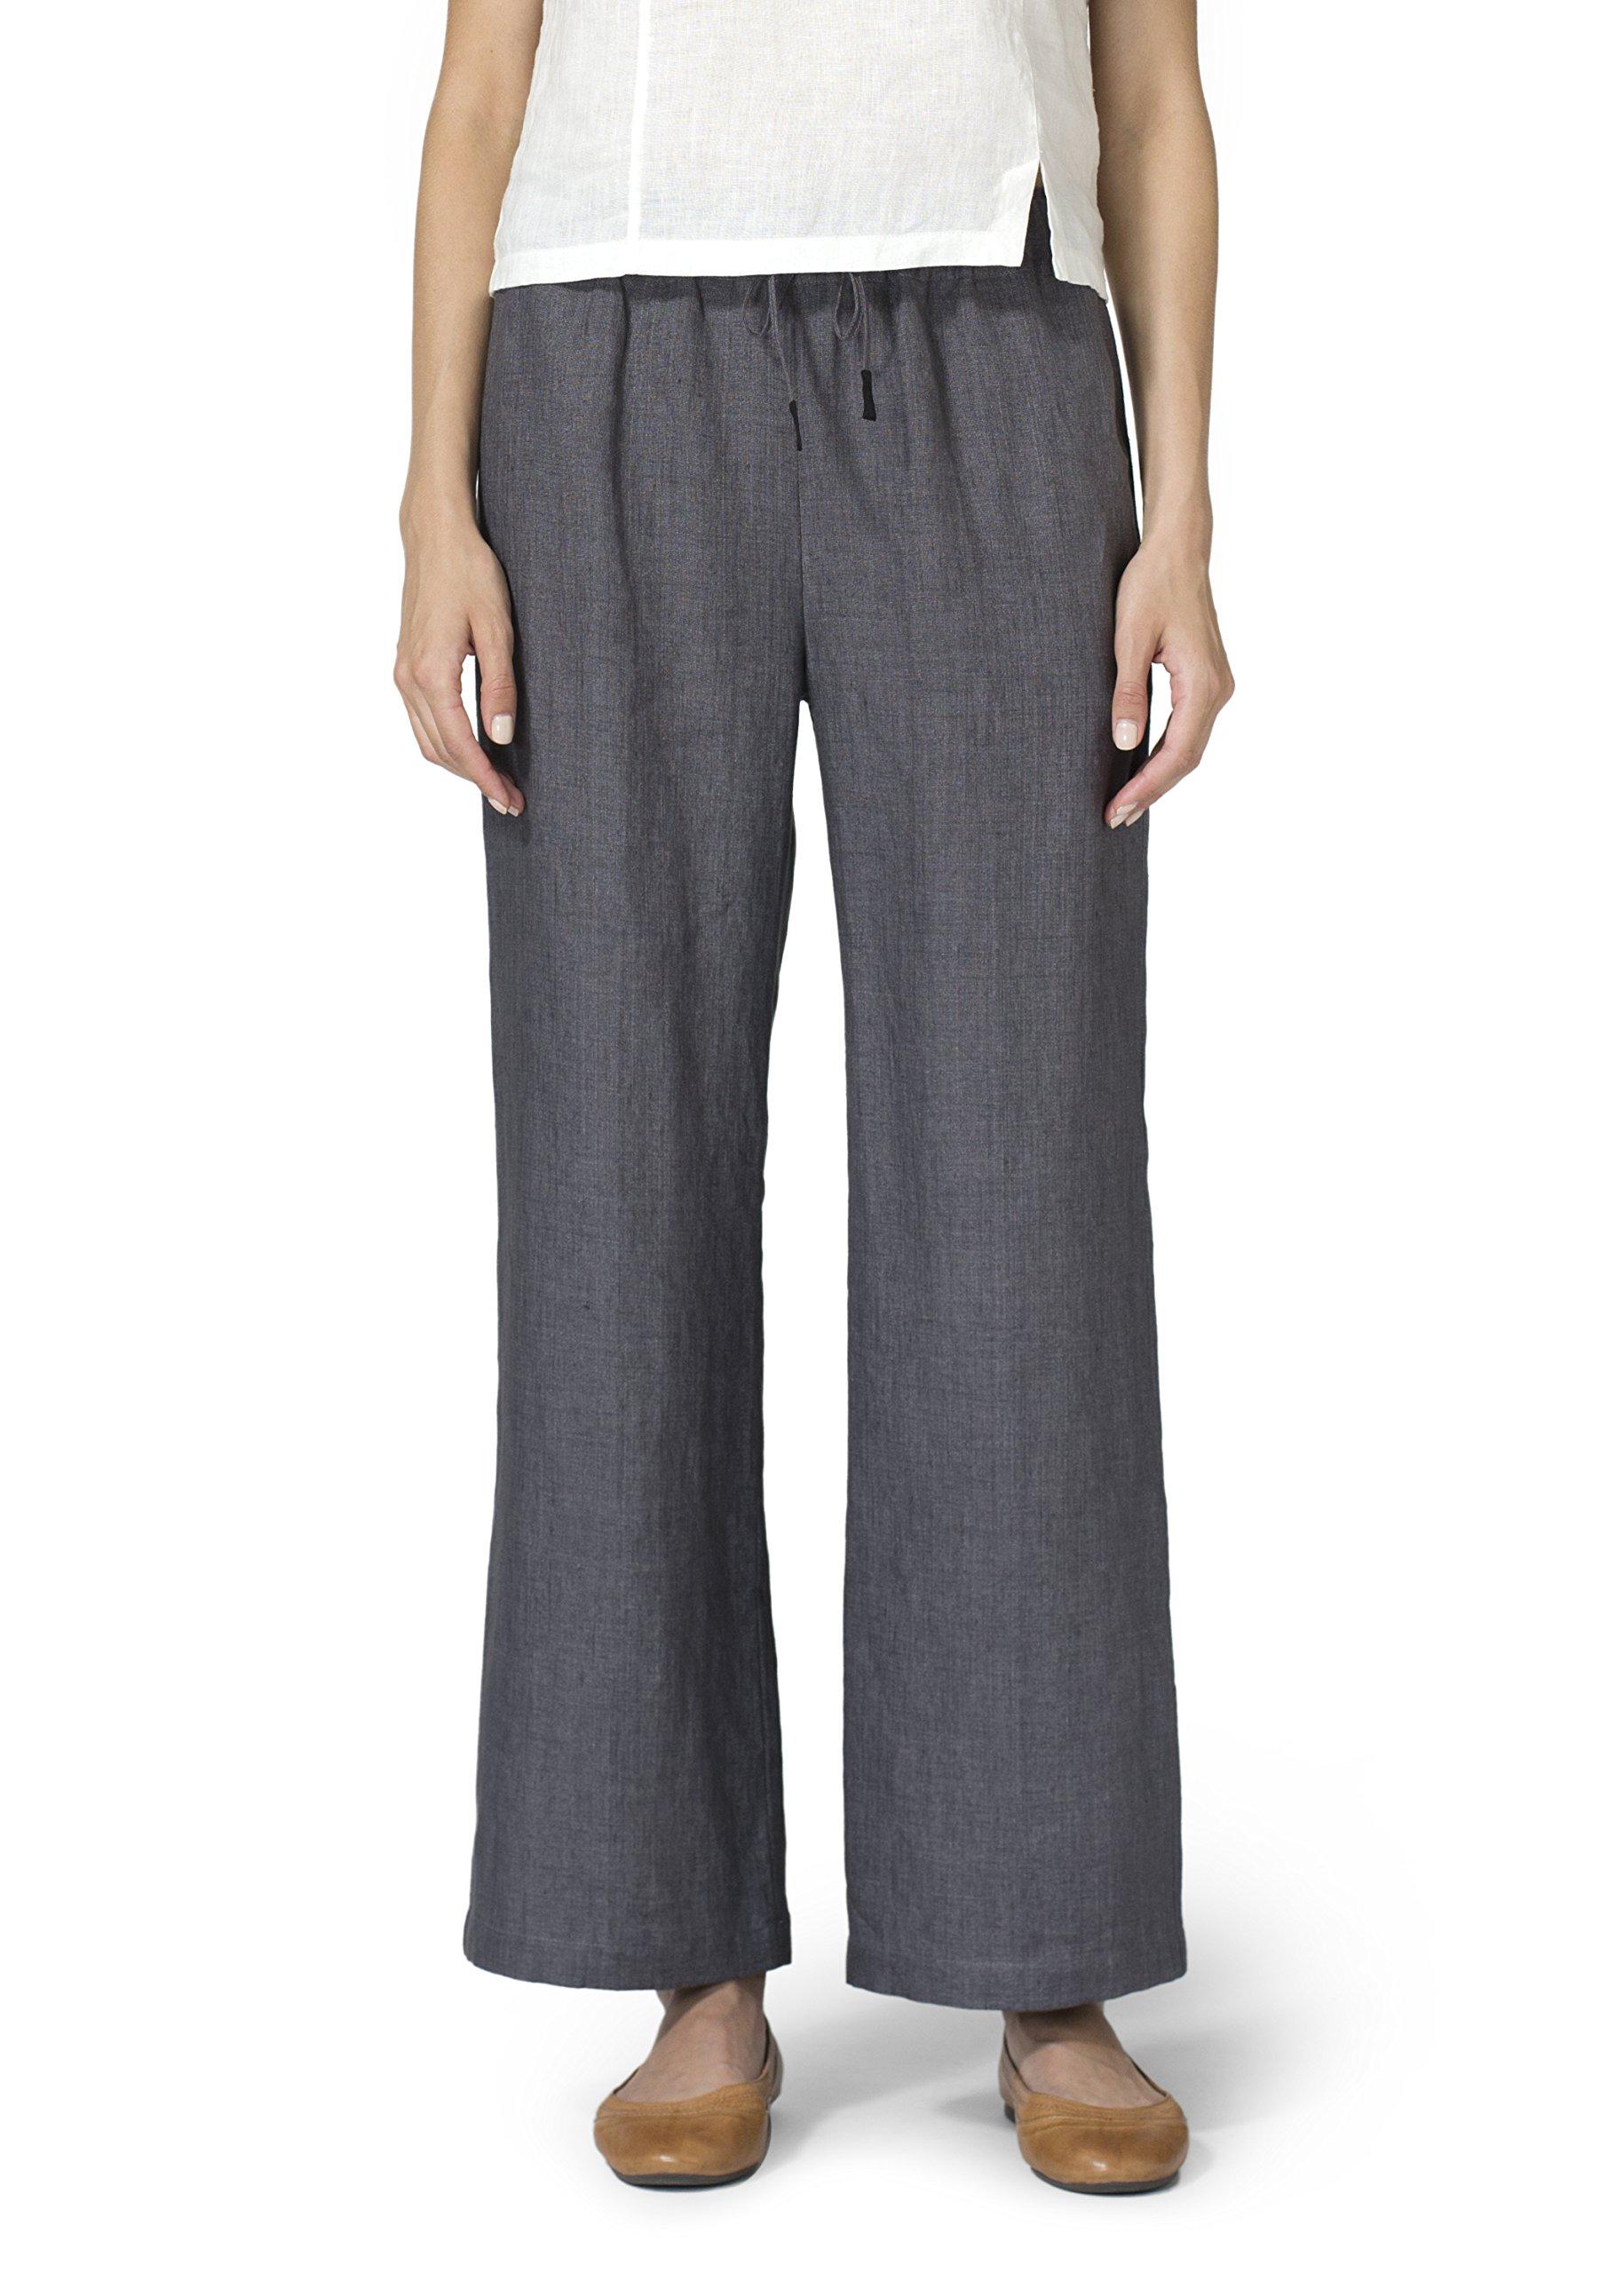 Vivid Linen Straight Pull On Pants-1X-Charcoal Gray